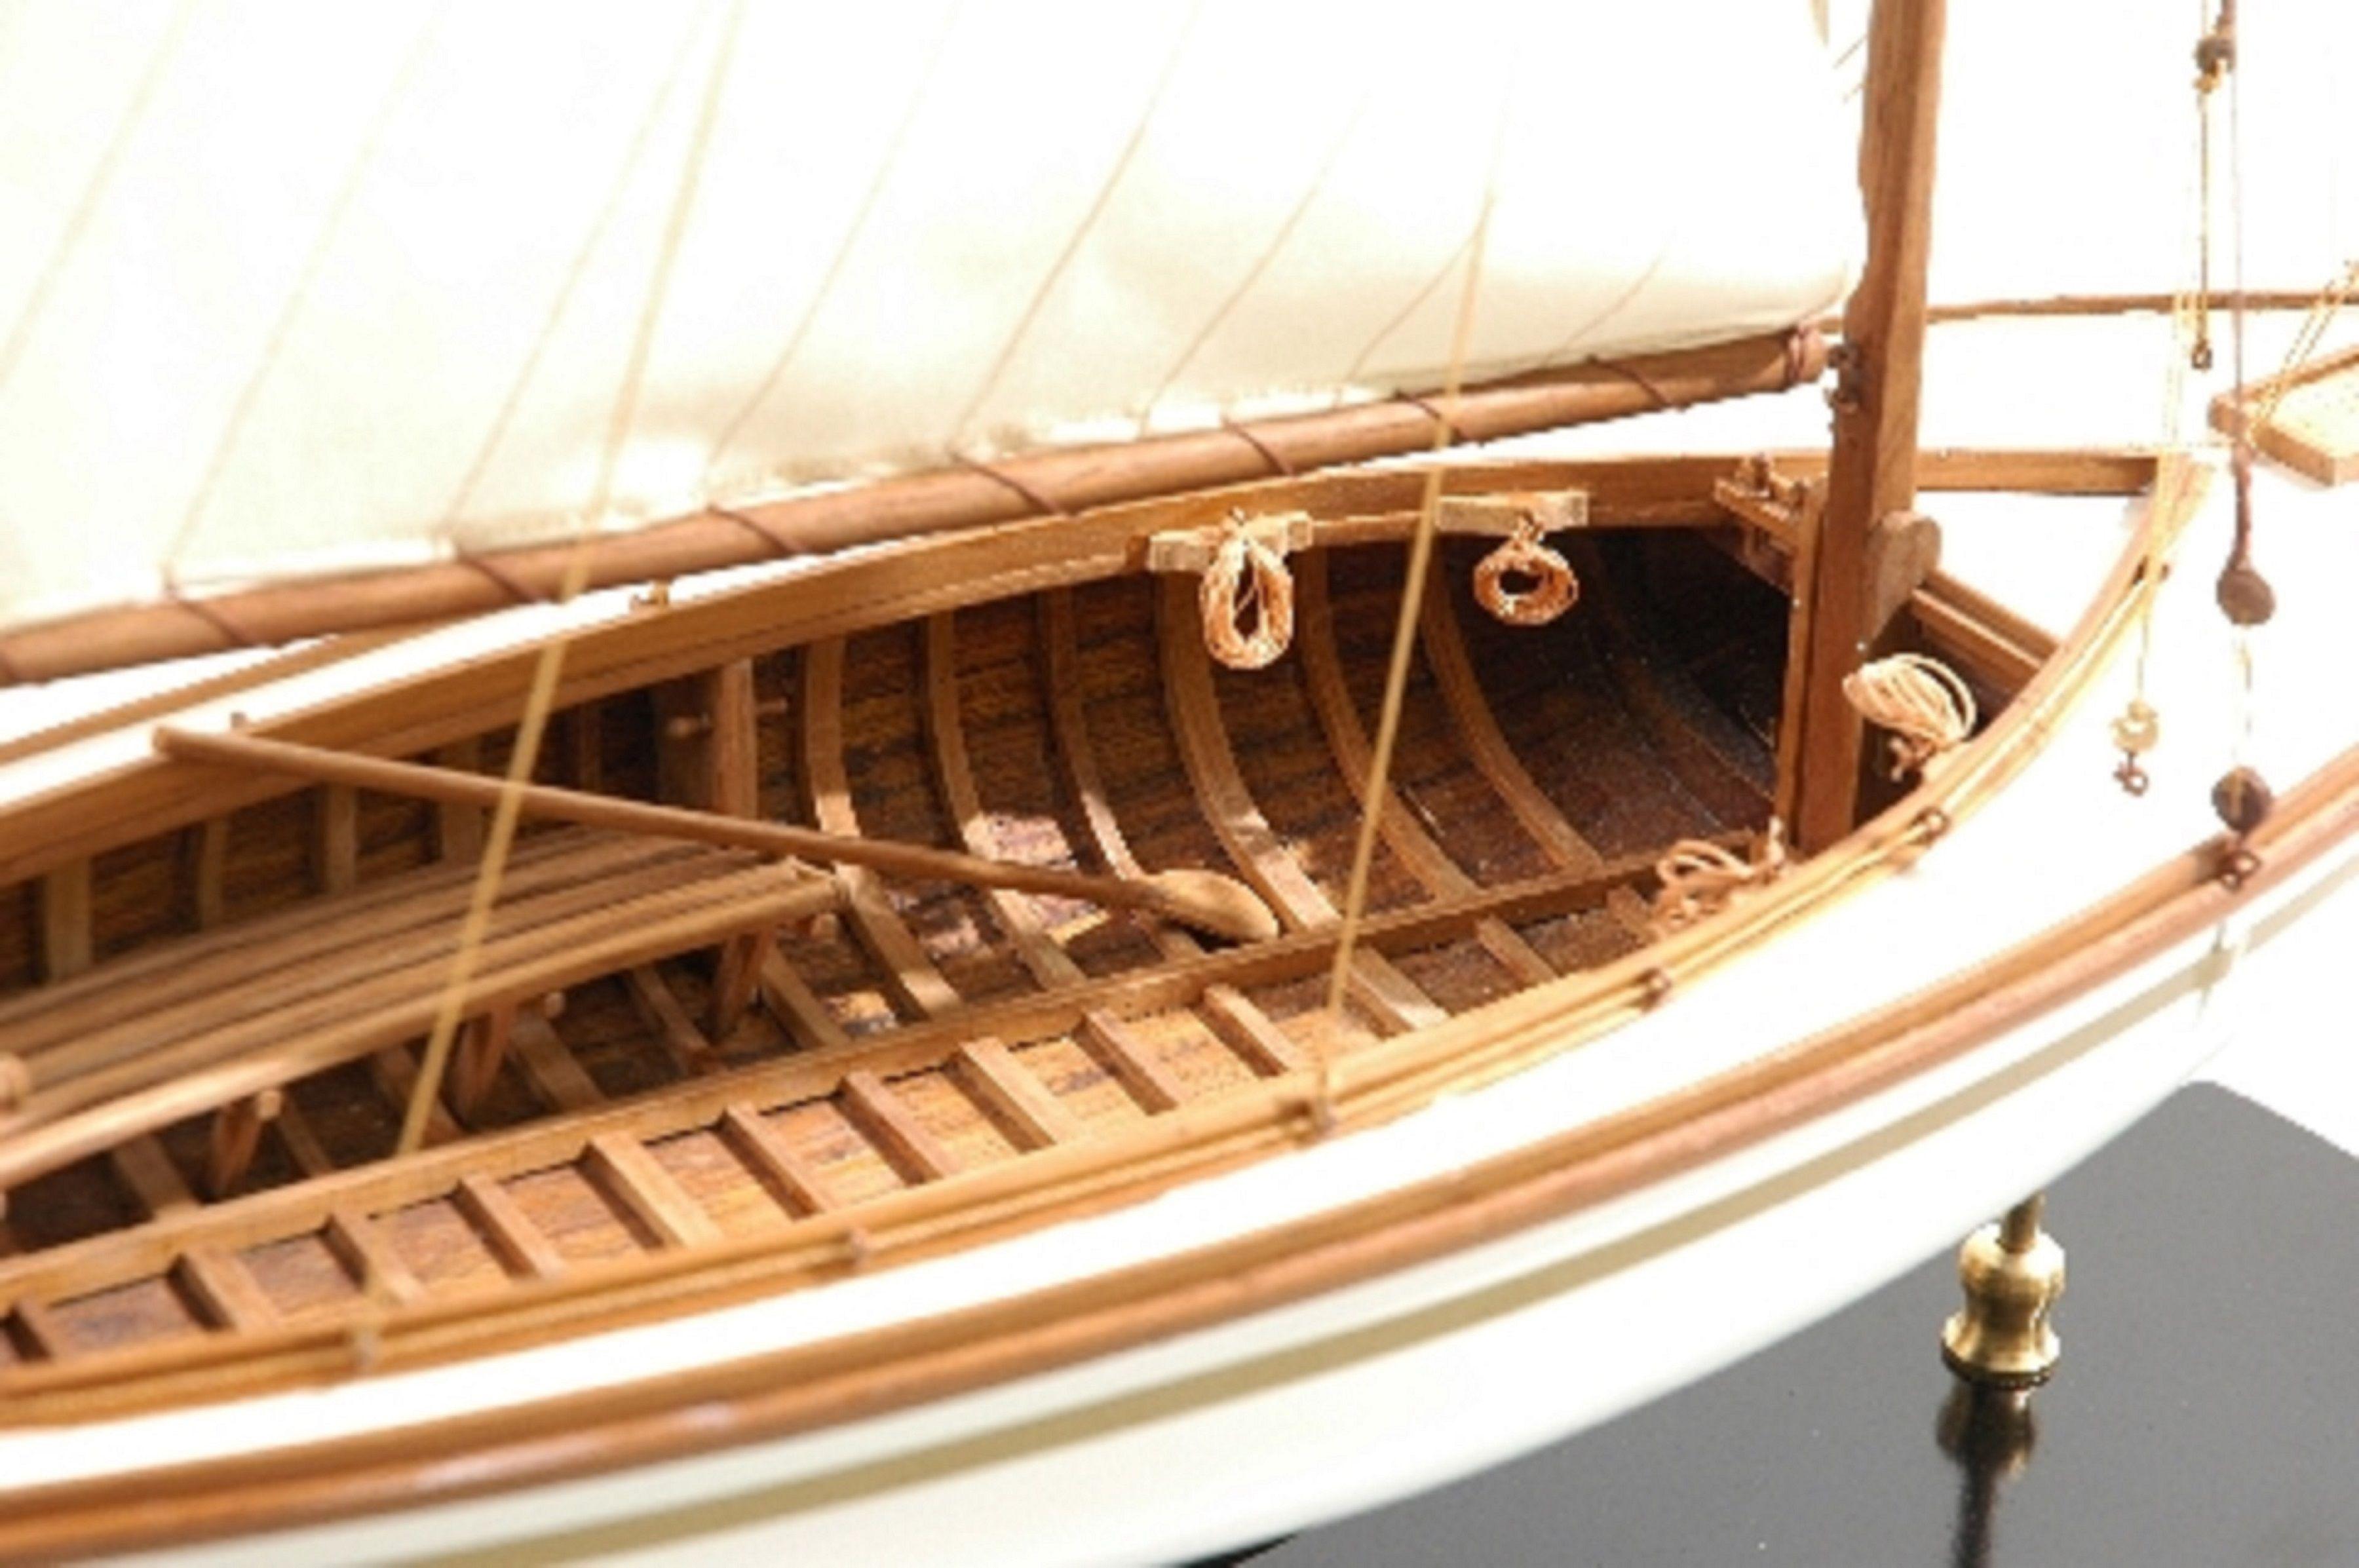 166-8438-Yare-Bure-Model-Yacht-Superior-Range